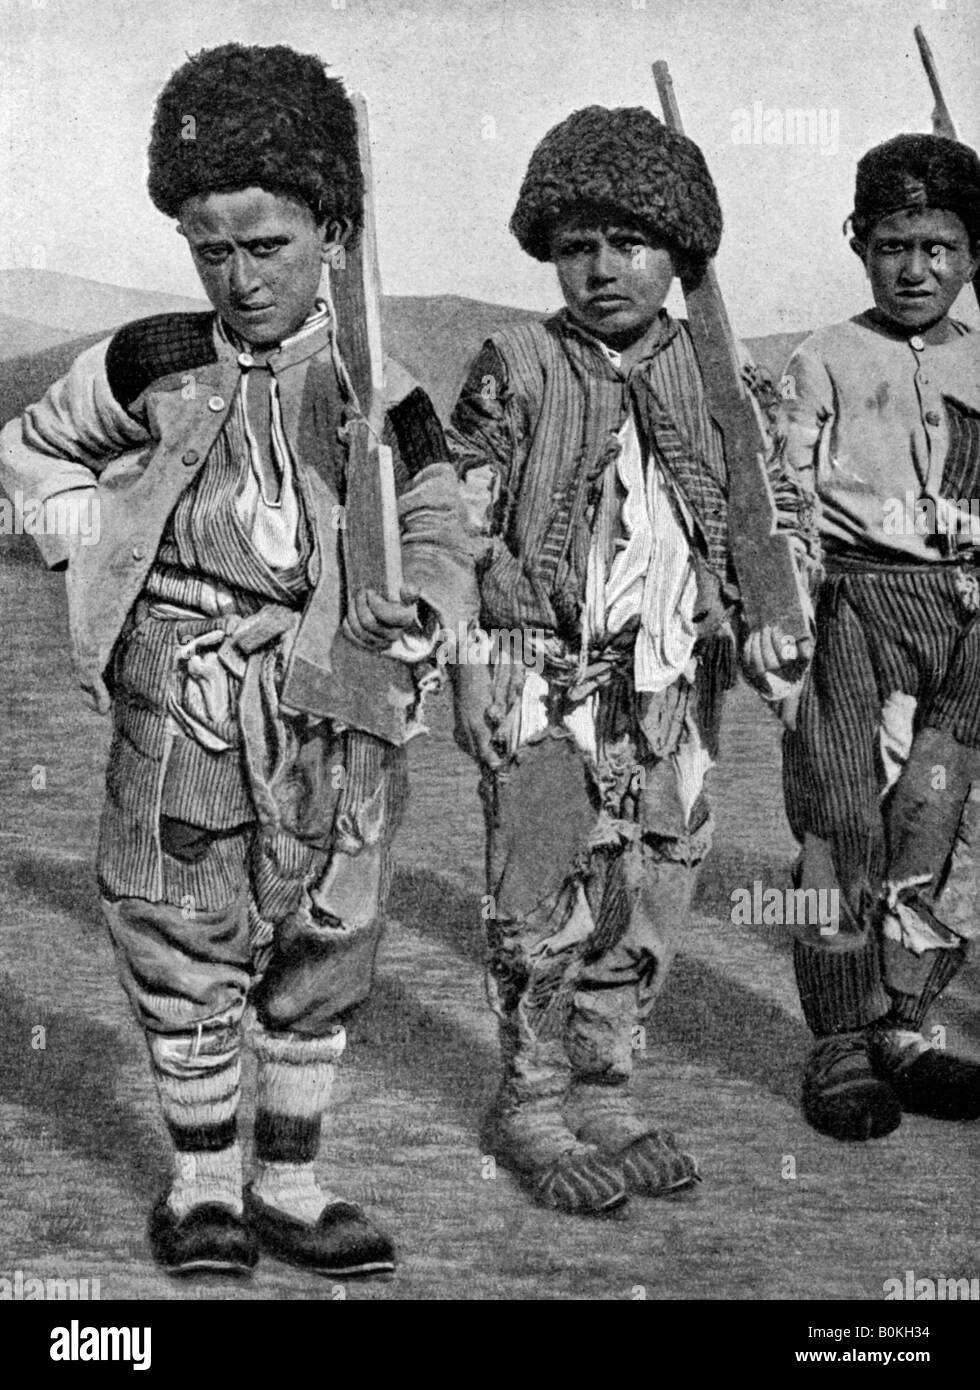 Boys from Artemid, Armenia, 1922.Artist: Maynard Owen Williams - Stock Image